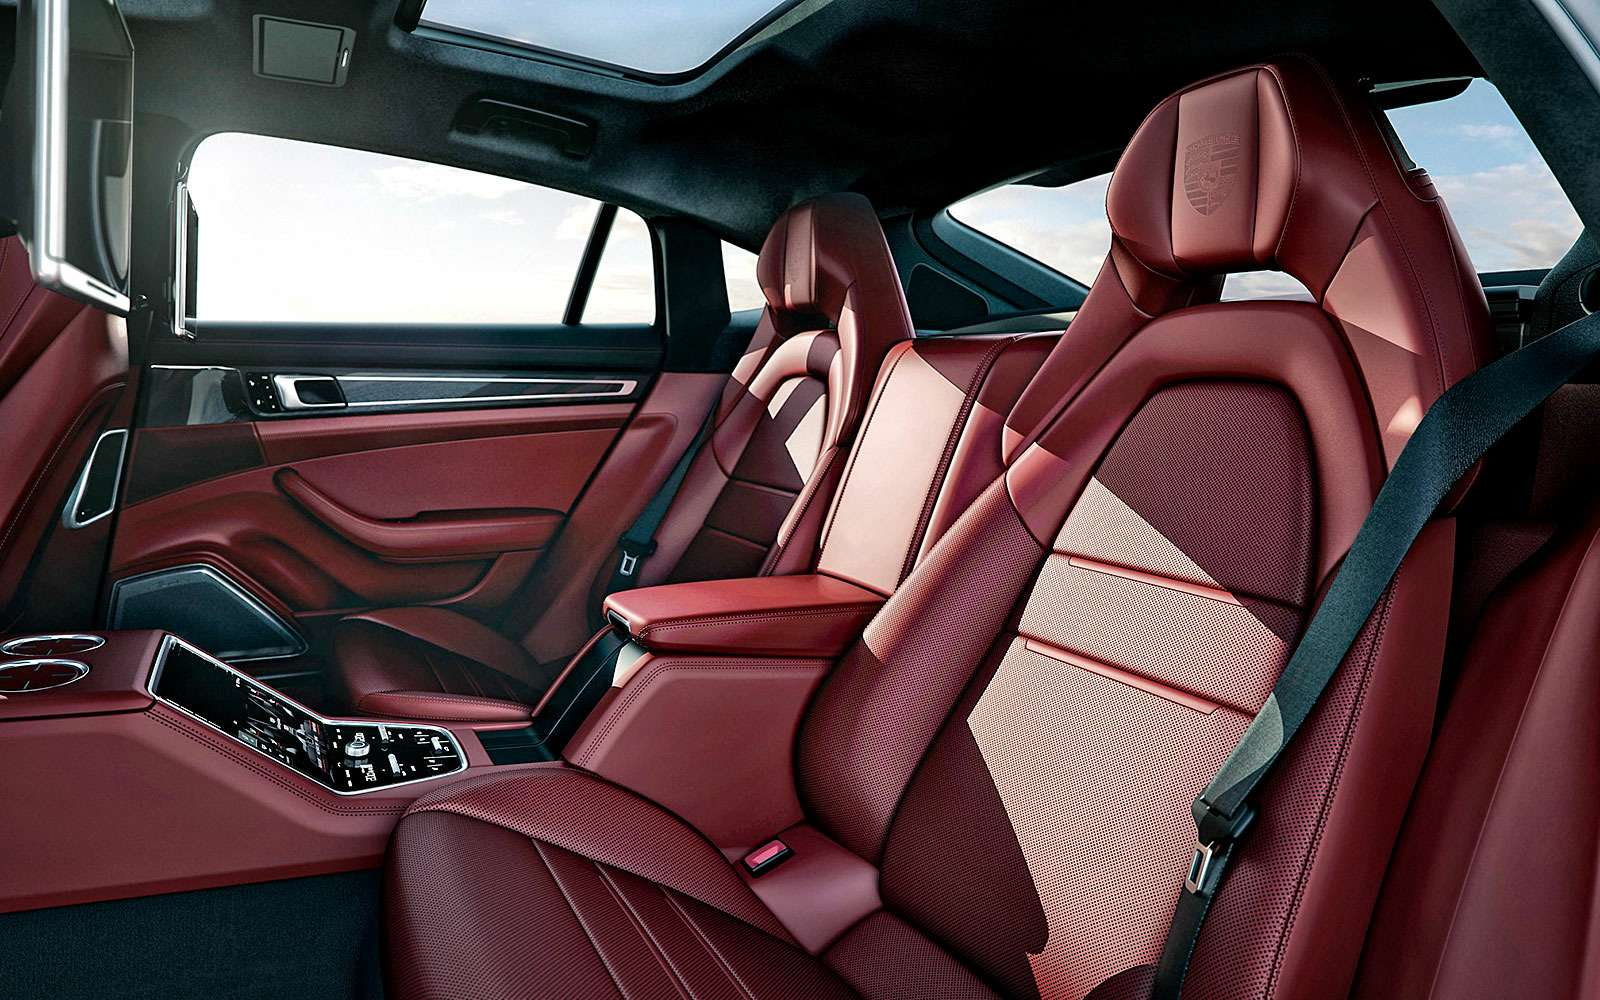 Porsche Panamera 4E-Hybrid